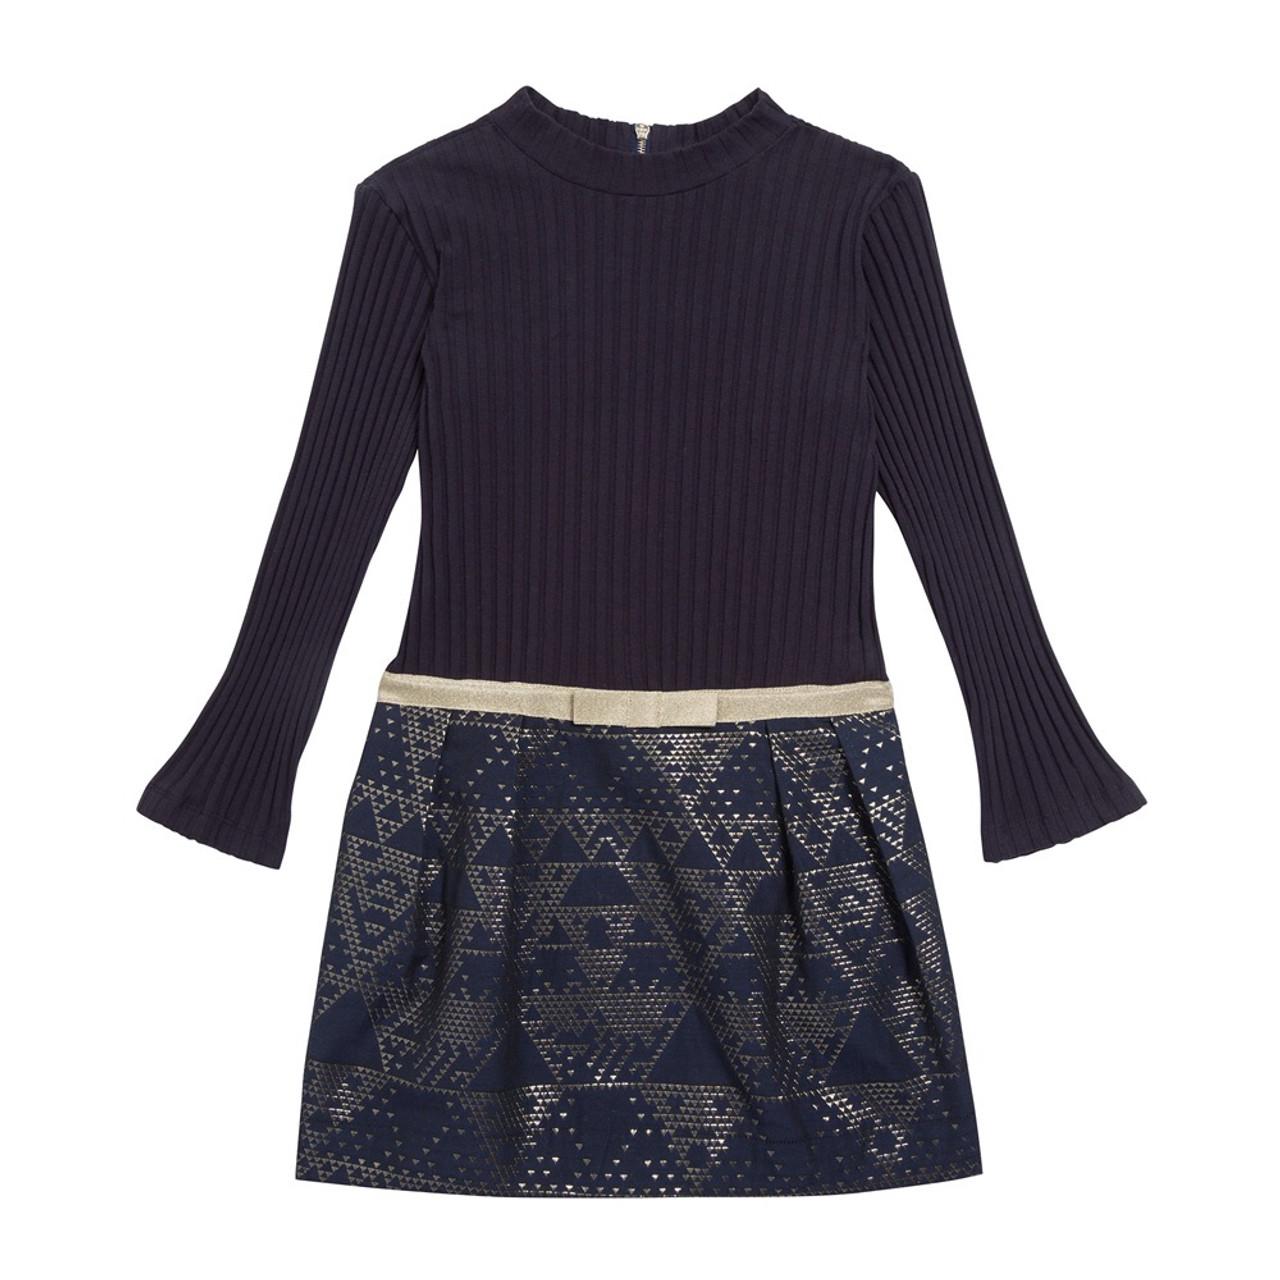 ff695b9ab Tartine et Chocolat drop-waist dress with modern print.